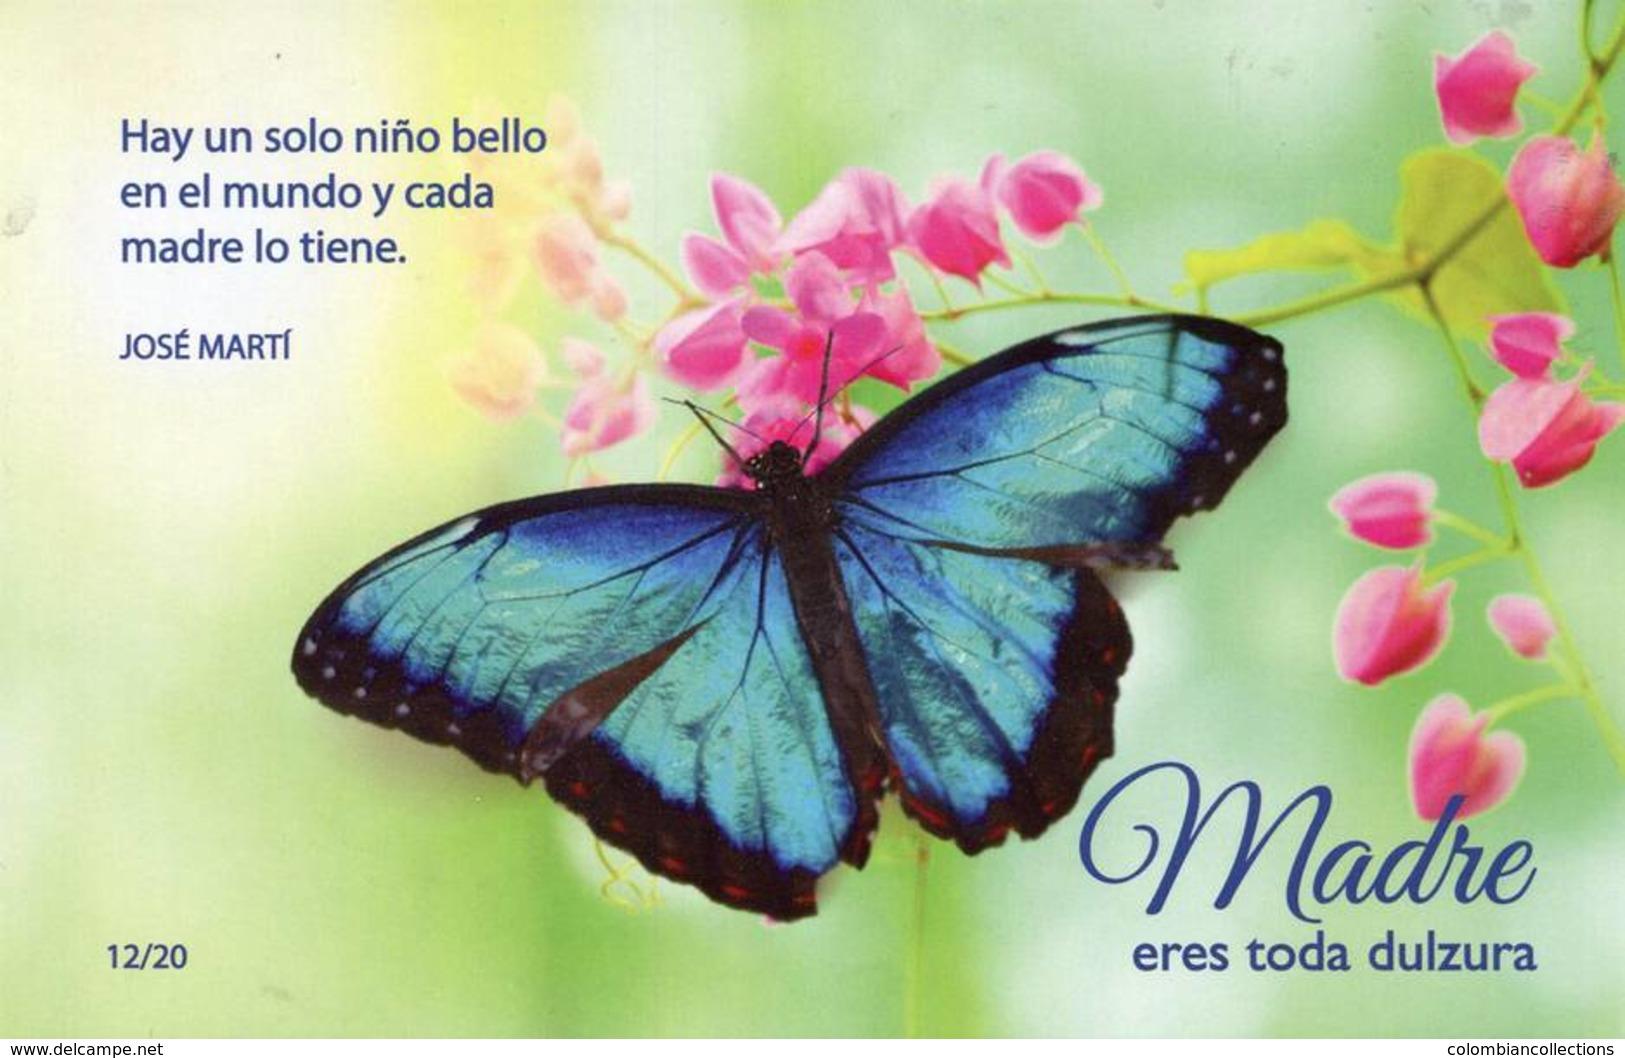 Lote PEP1250, Cuba, Entero Postal, Postal Stationery, Dia De Las Madres, Flor, Mariposa, 12-20, Butterfly, Orchid - Maximumkarten